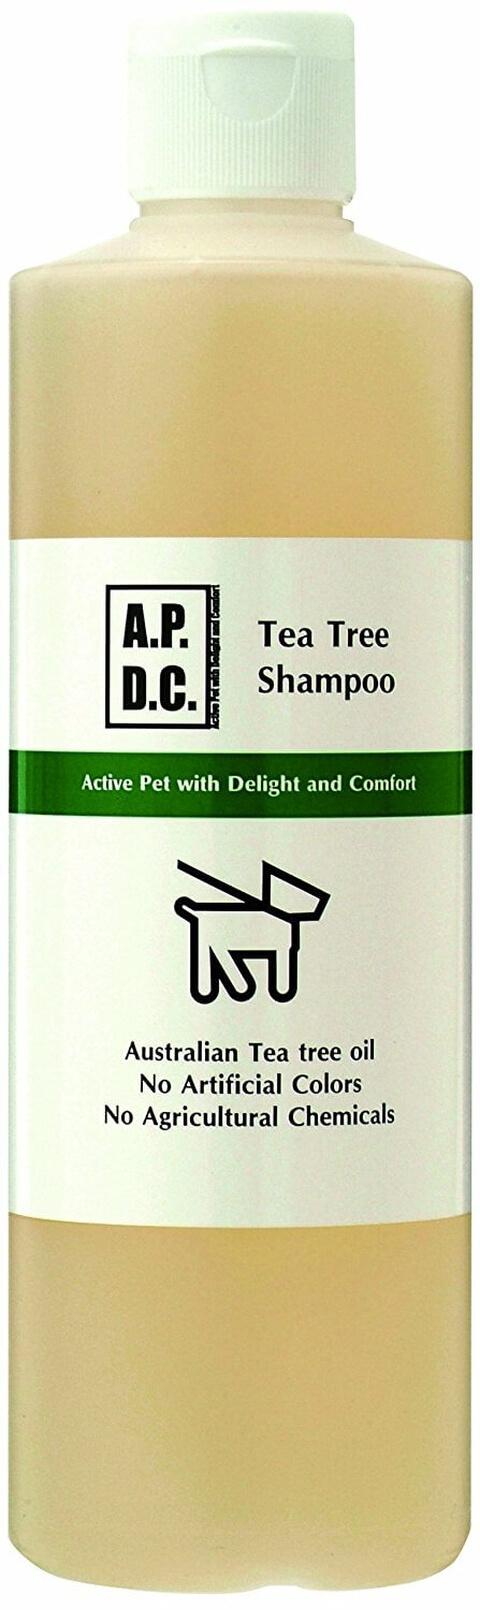 shampu